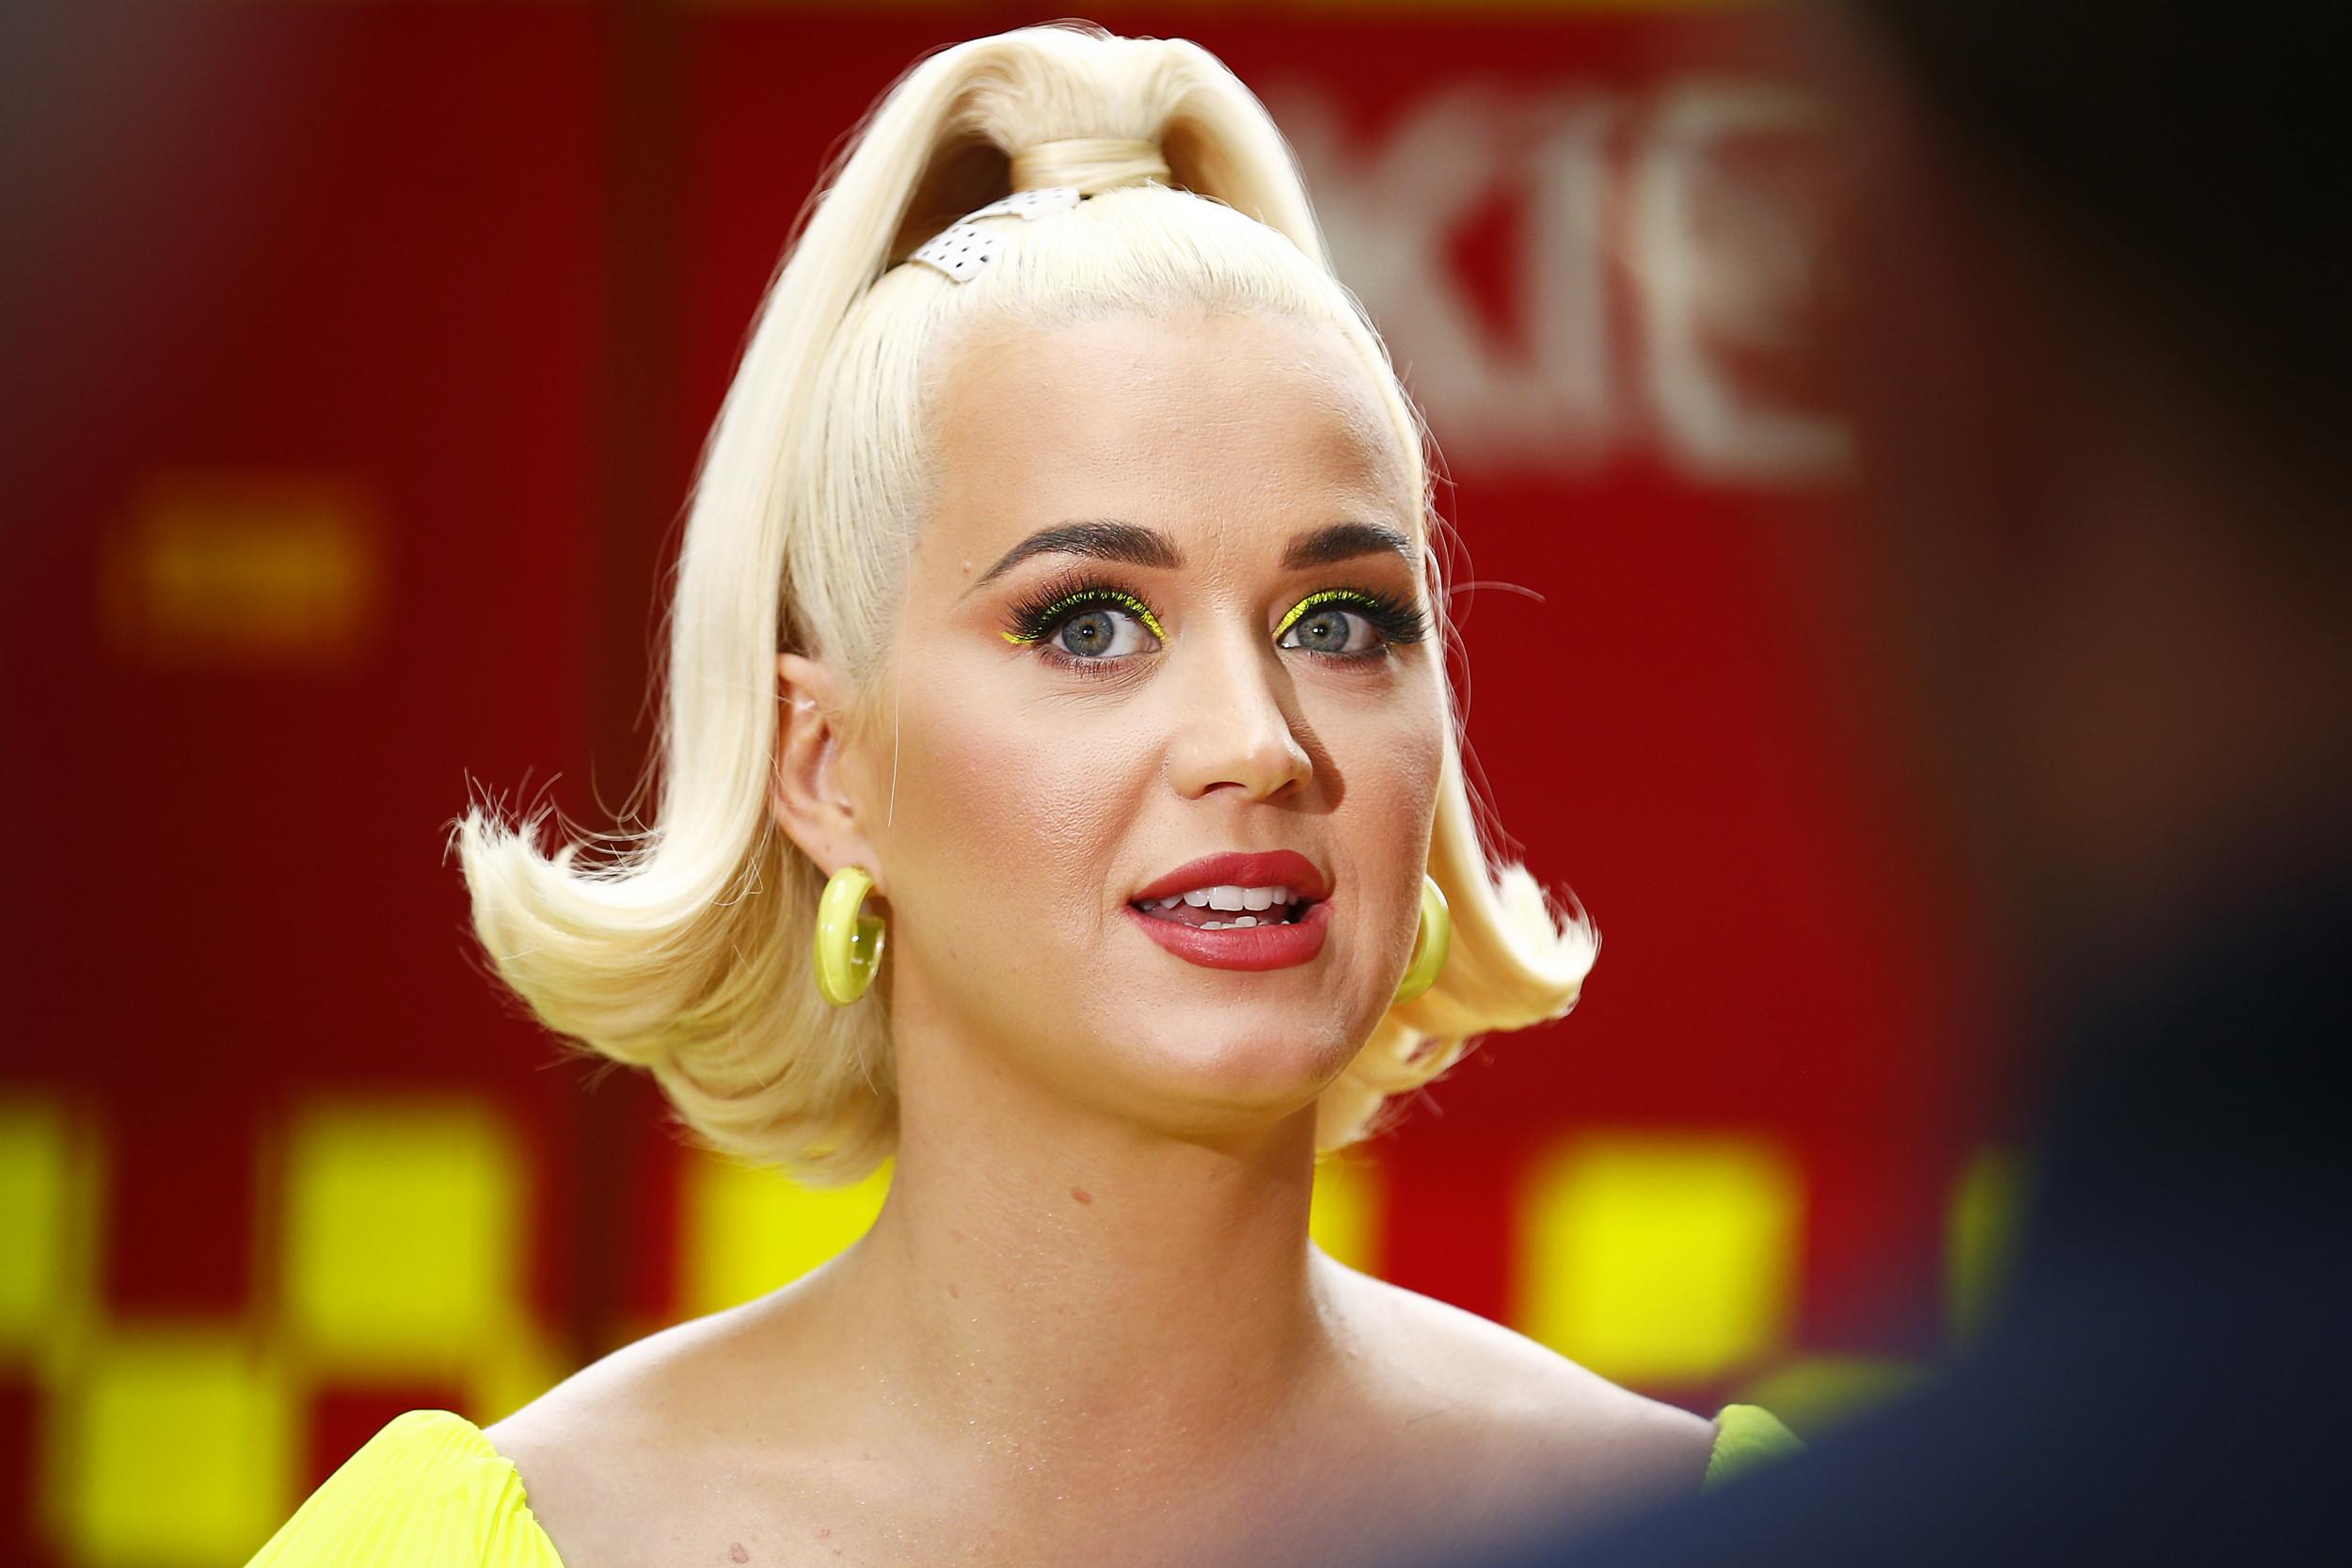 Katy Perry Reveals 'Wonk Eye' Details on 'American Idol'